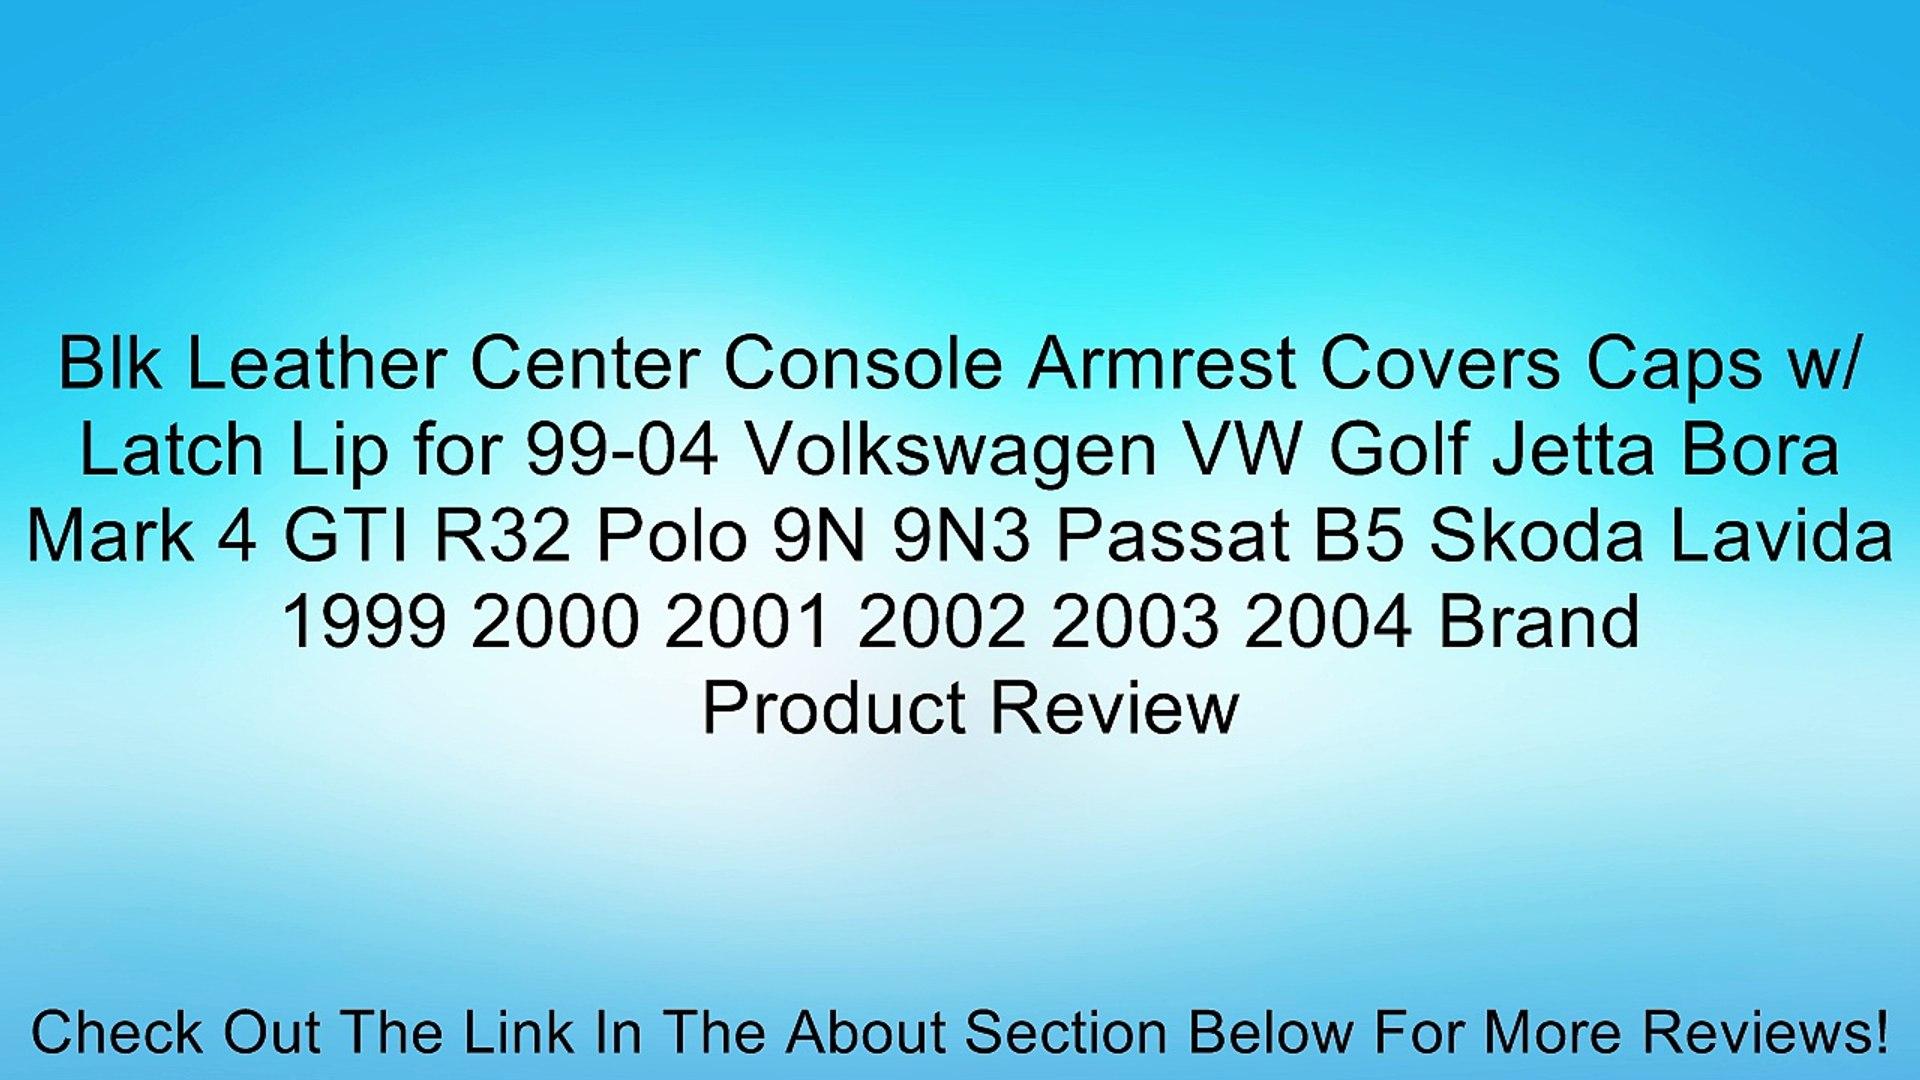 Blk Leather Center Console Armrest Covers Caps w/ Latch Lip for 99-04  Volkswagen VW Golf Jetta Bora Mark 4 GTI R32 Polo 9N 9N3 Passat B5 Skoda  Lavida 1999 2000 2001 2002 2003 2004 Brand Review